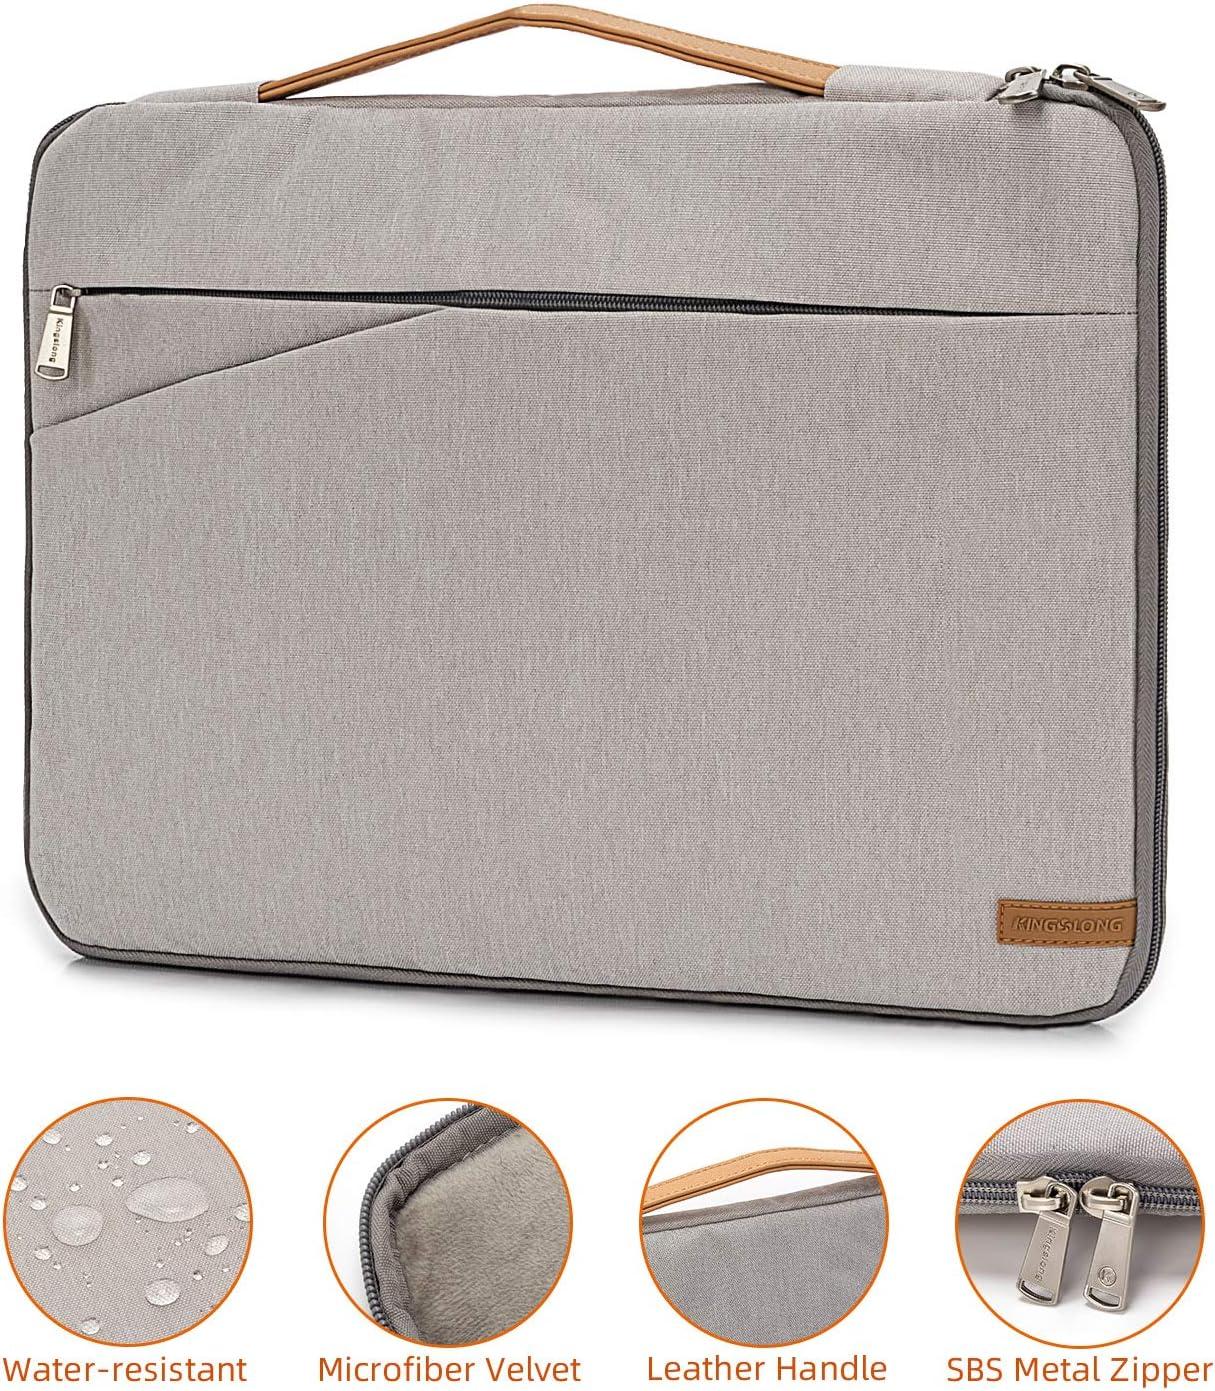 Laptop Sleeve 17.3 inch Laptop Case for Men Women Laptop Bag Commute Briefcase Business Laptop Cover MacBook Pro Notebook Protective Case(Gray)